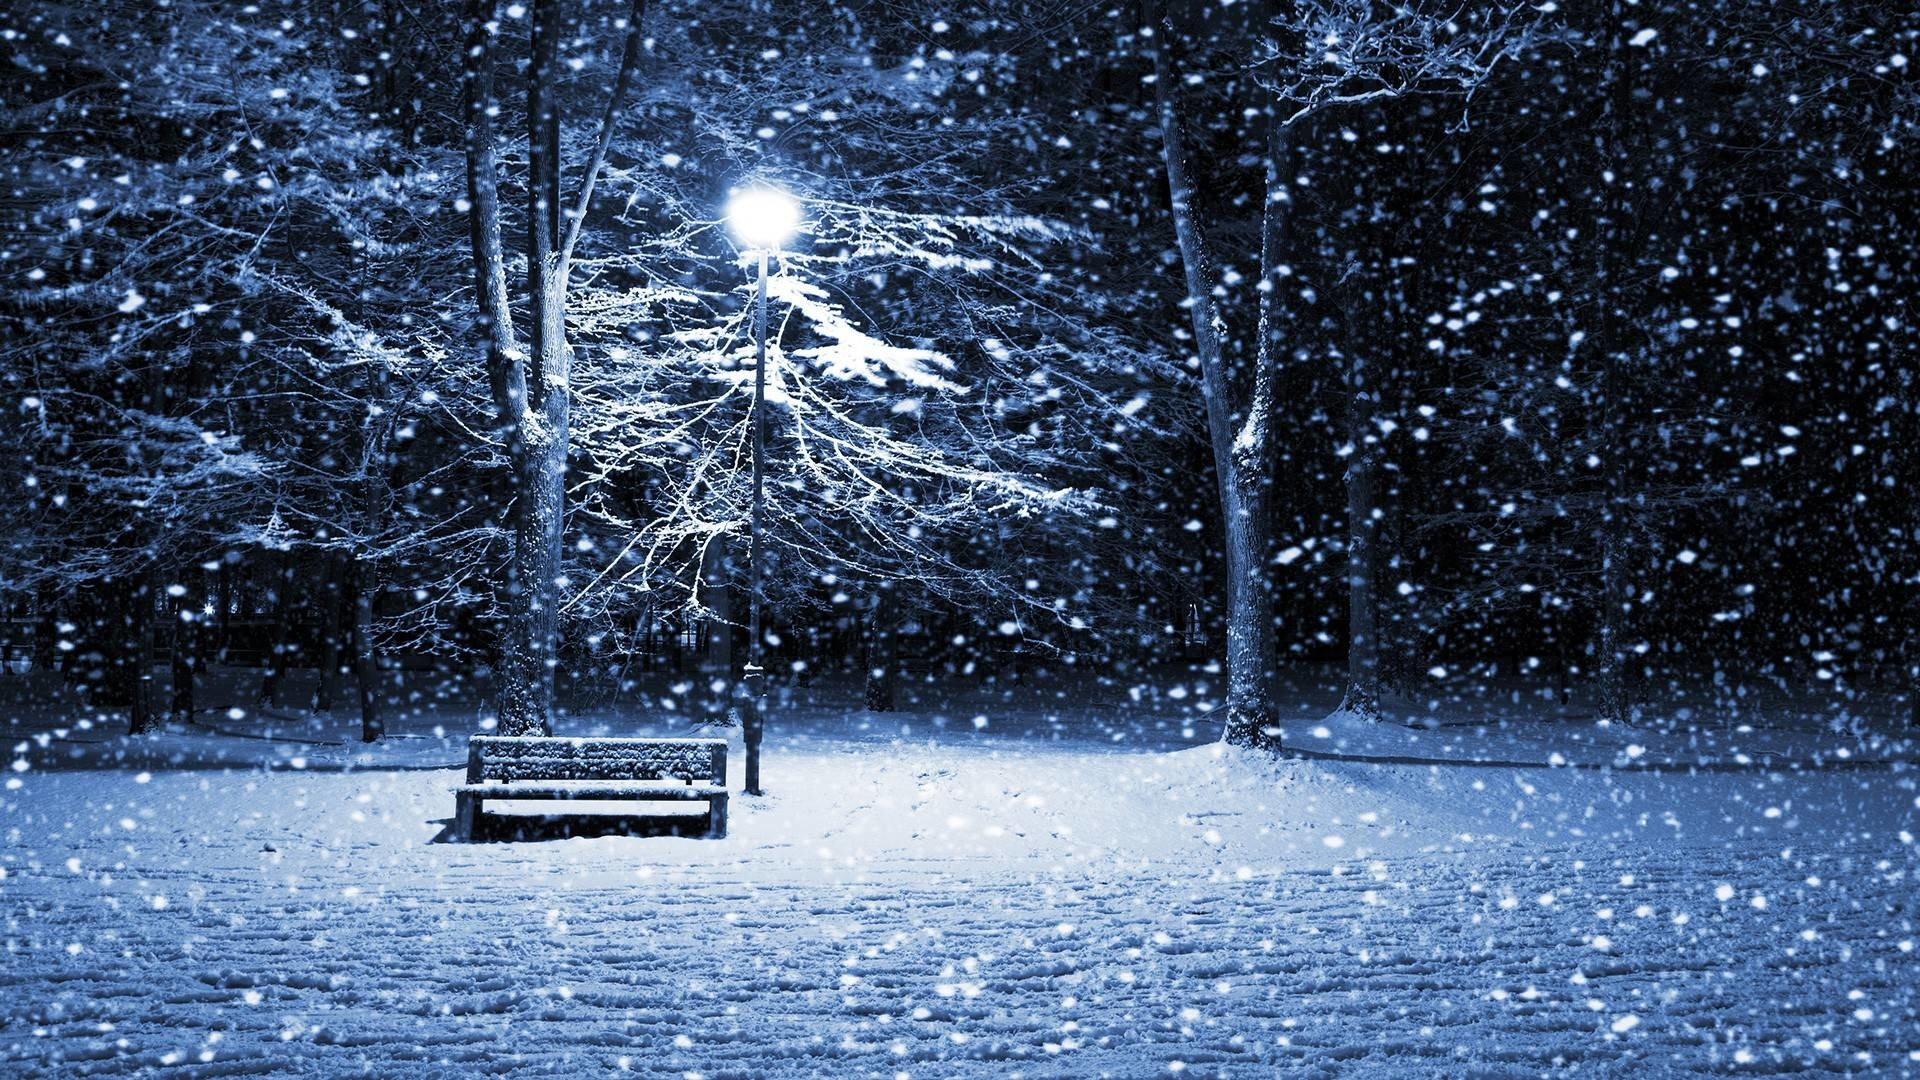 Winter Snowfall HD desktop wallpaper High Definition Mobile ...